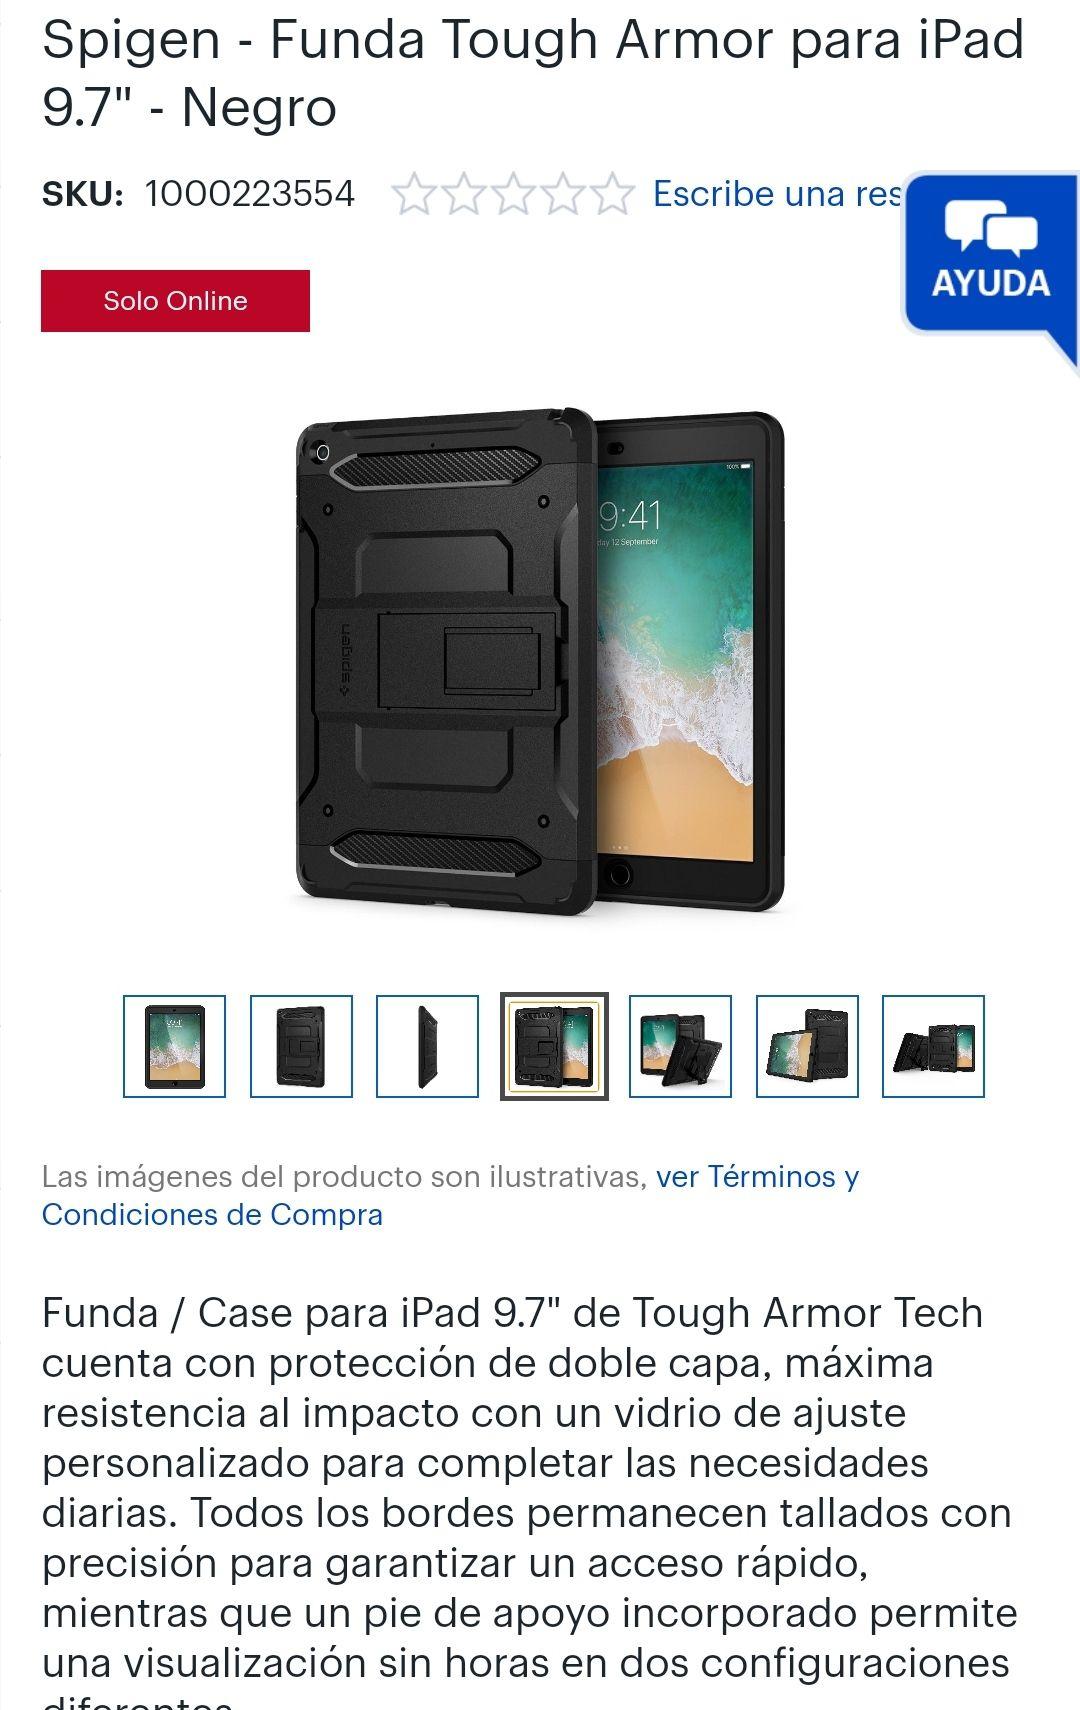 "Best Buy- Spigen - Funda Tough Armor para iPad 9.7"" - Negro"